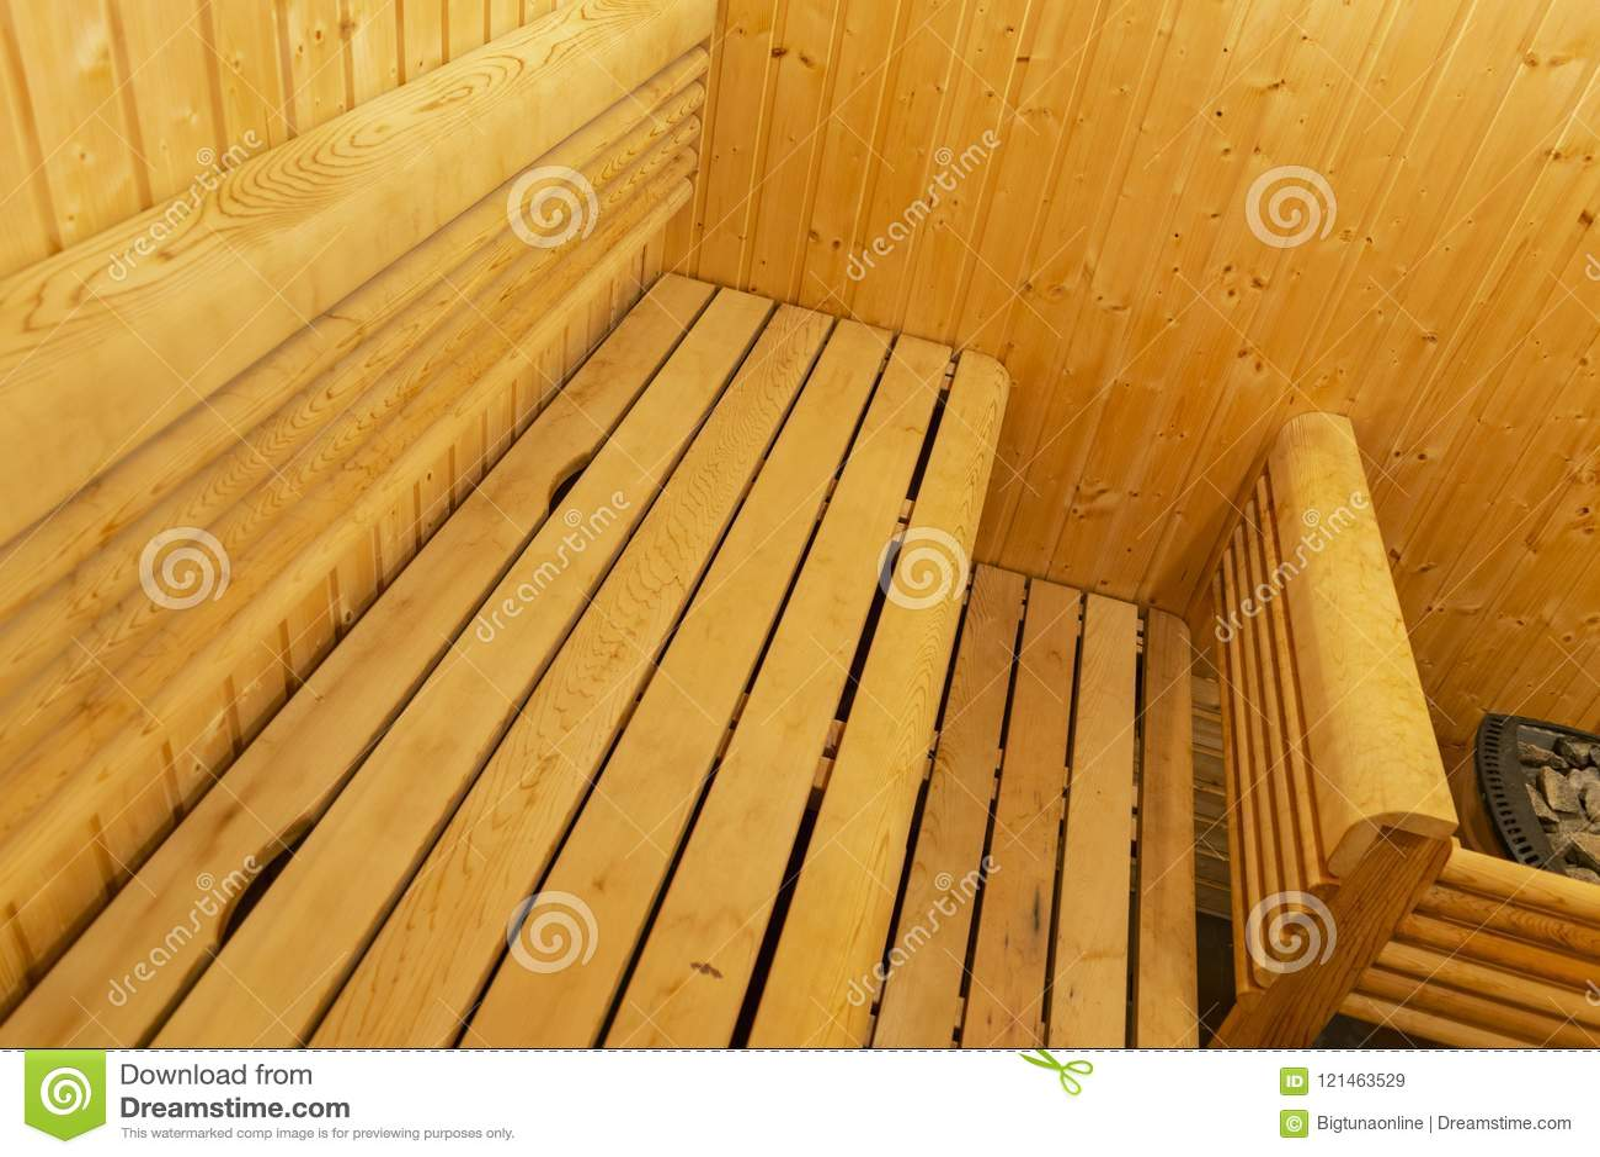 Interiore di sauna finlandese Sauna di legno classica Bagno finlandese  Cabina di legno di sauna Stanza